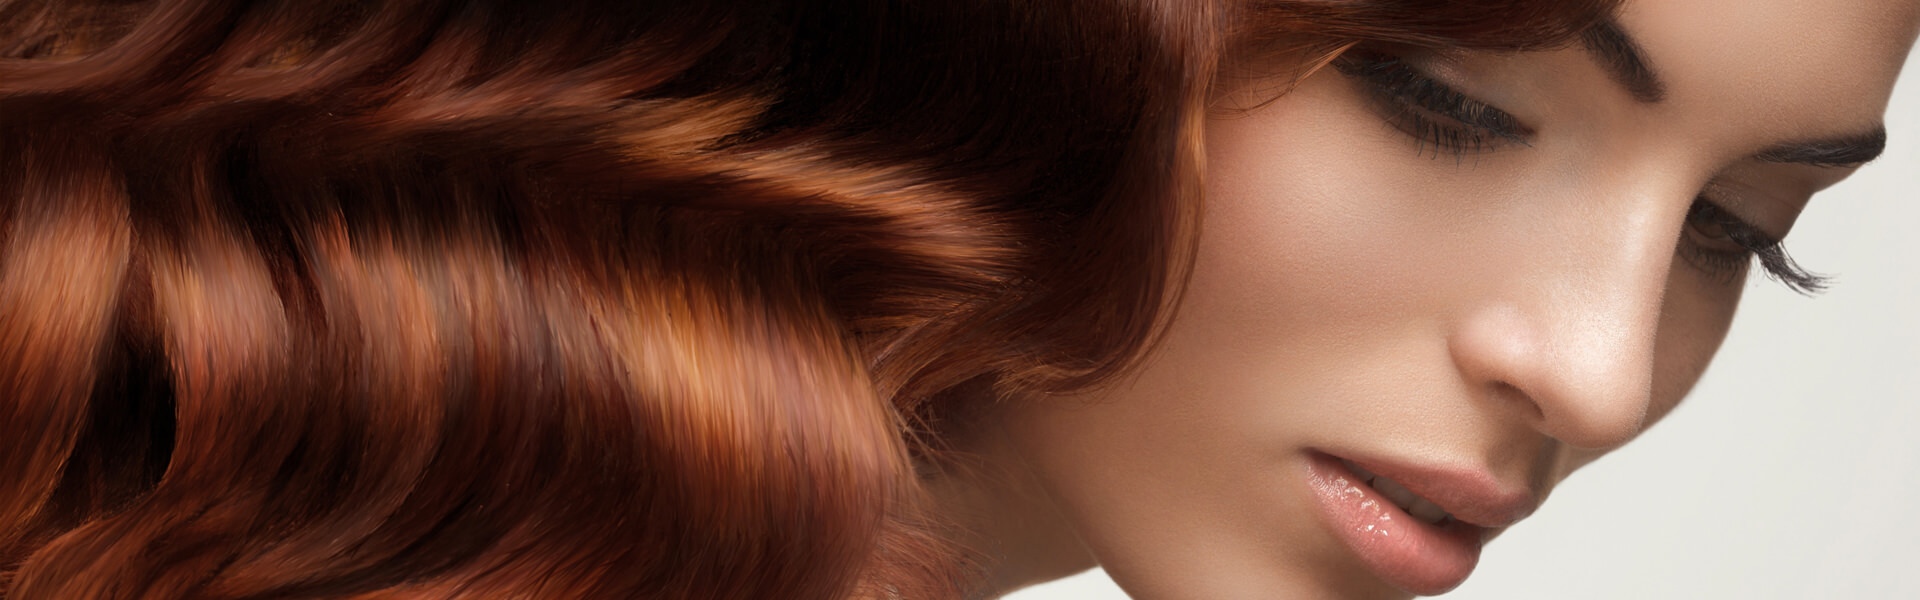 trattamenti naturali per capelli